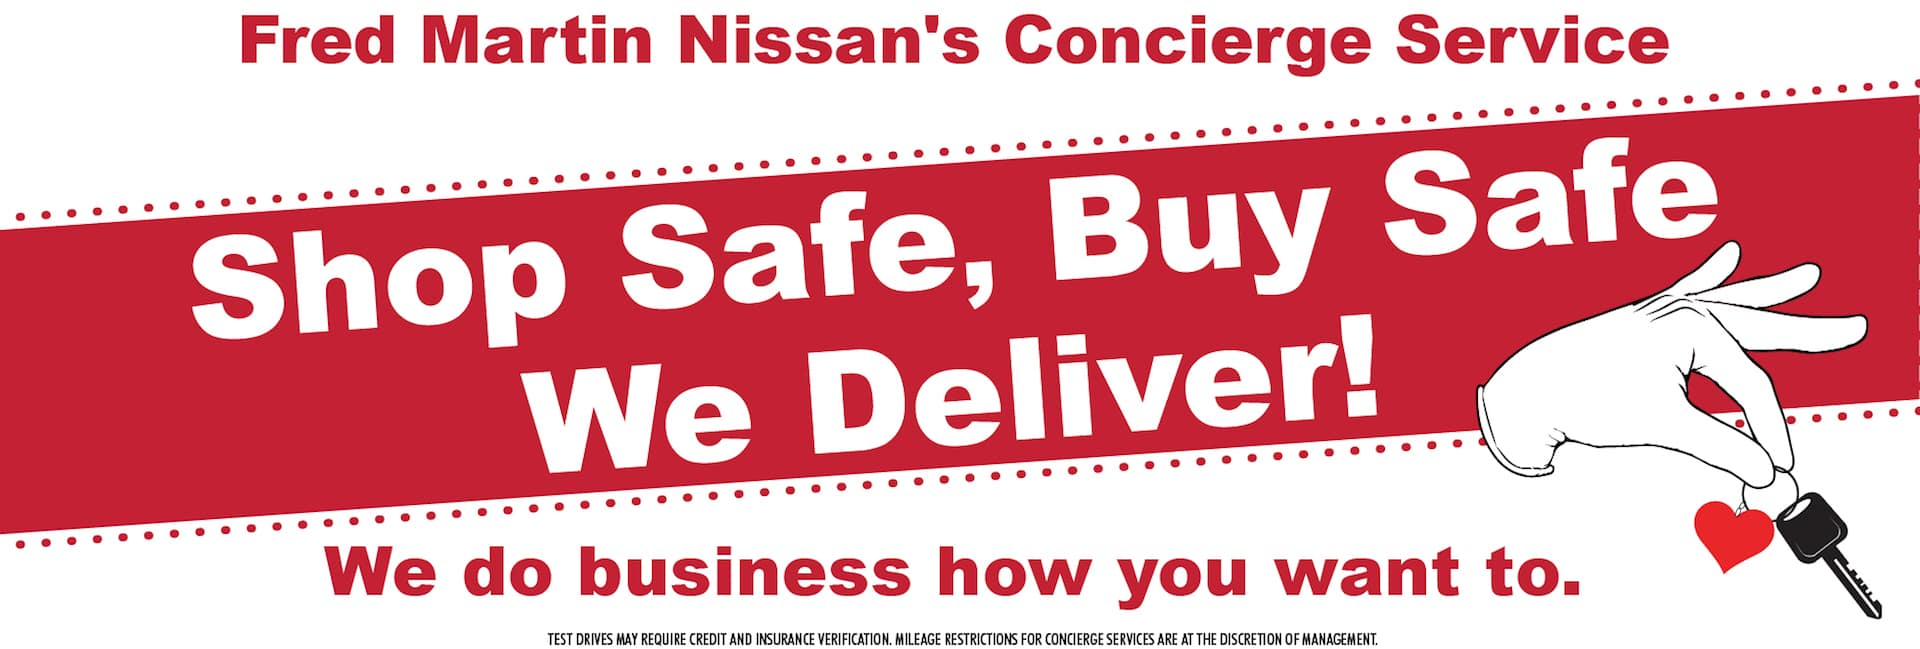 FMN_Concierge Service_Website Banner